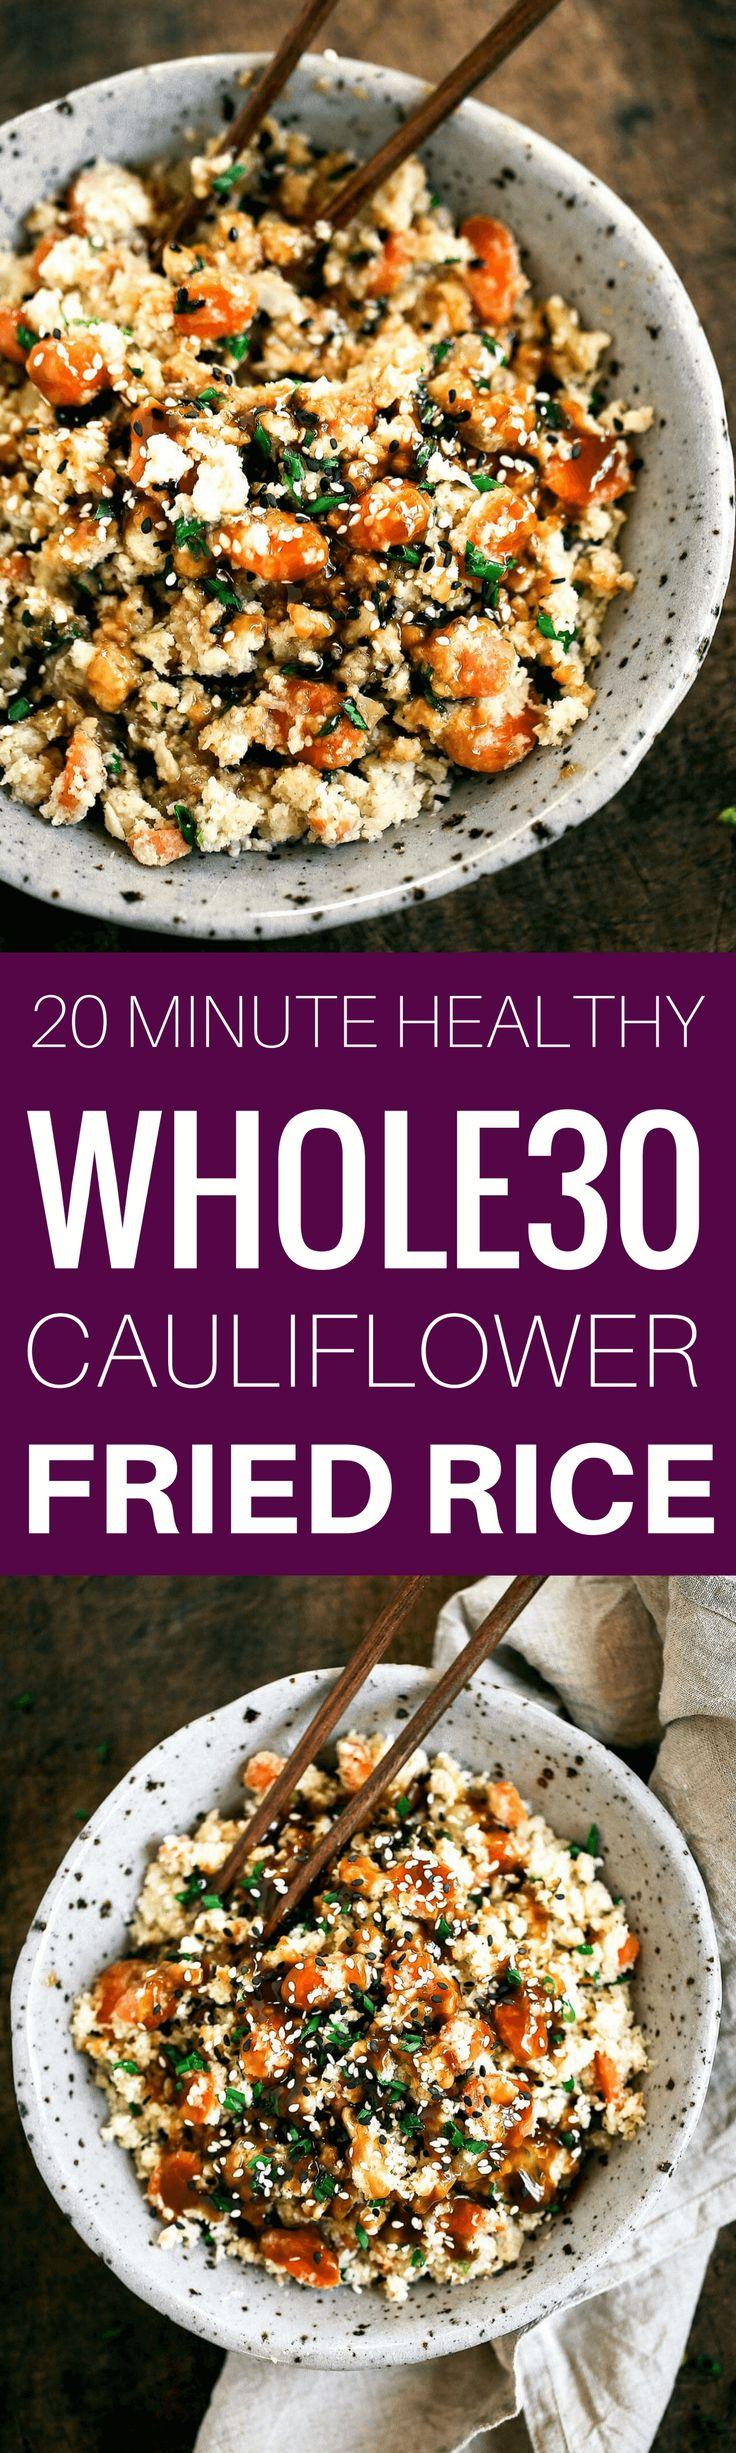 Whole30 Fried Cauliflower Rice | Paleo Gluten Free Eats